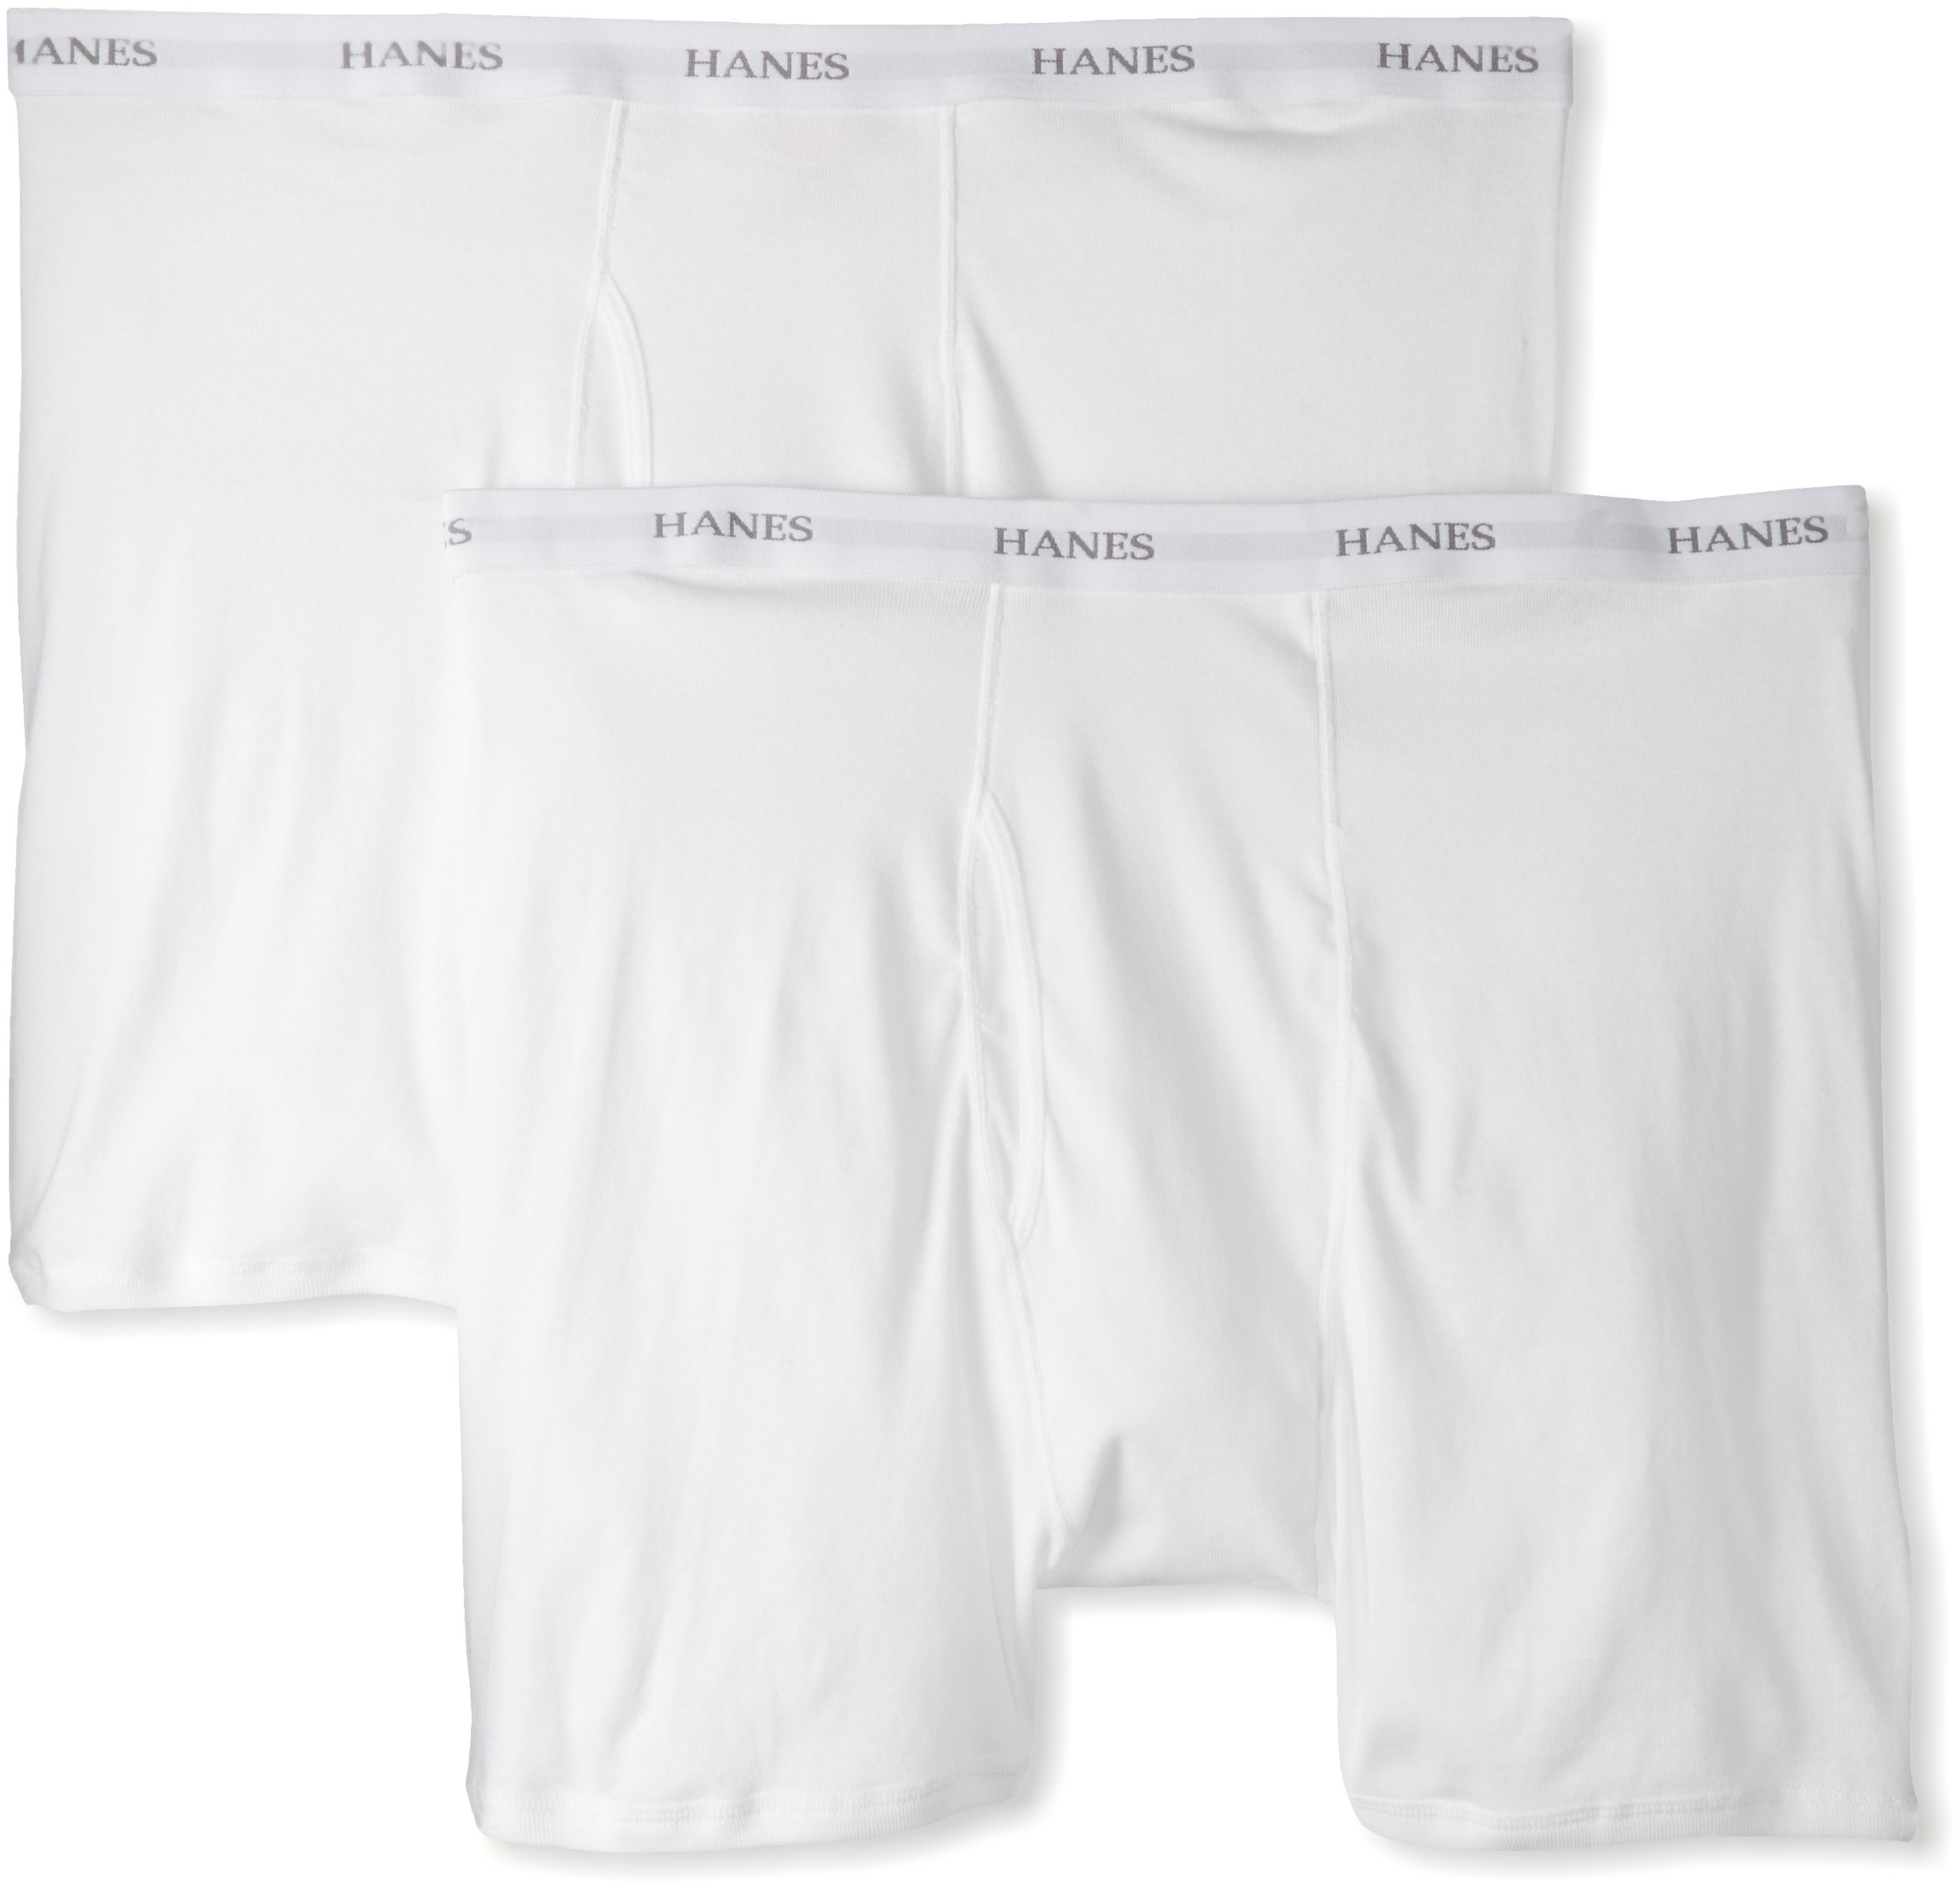 HANES CLASSICS /& HANES  two pak boxer briefs